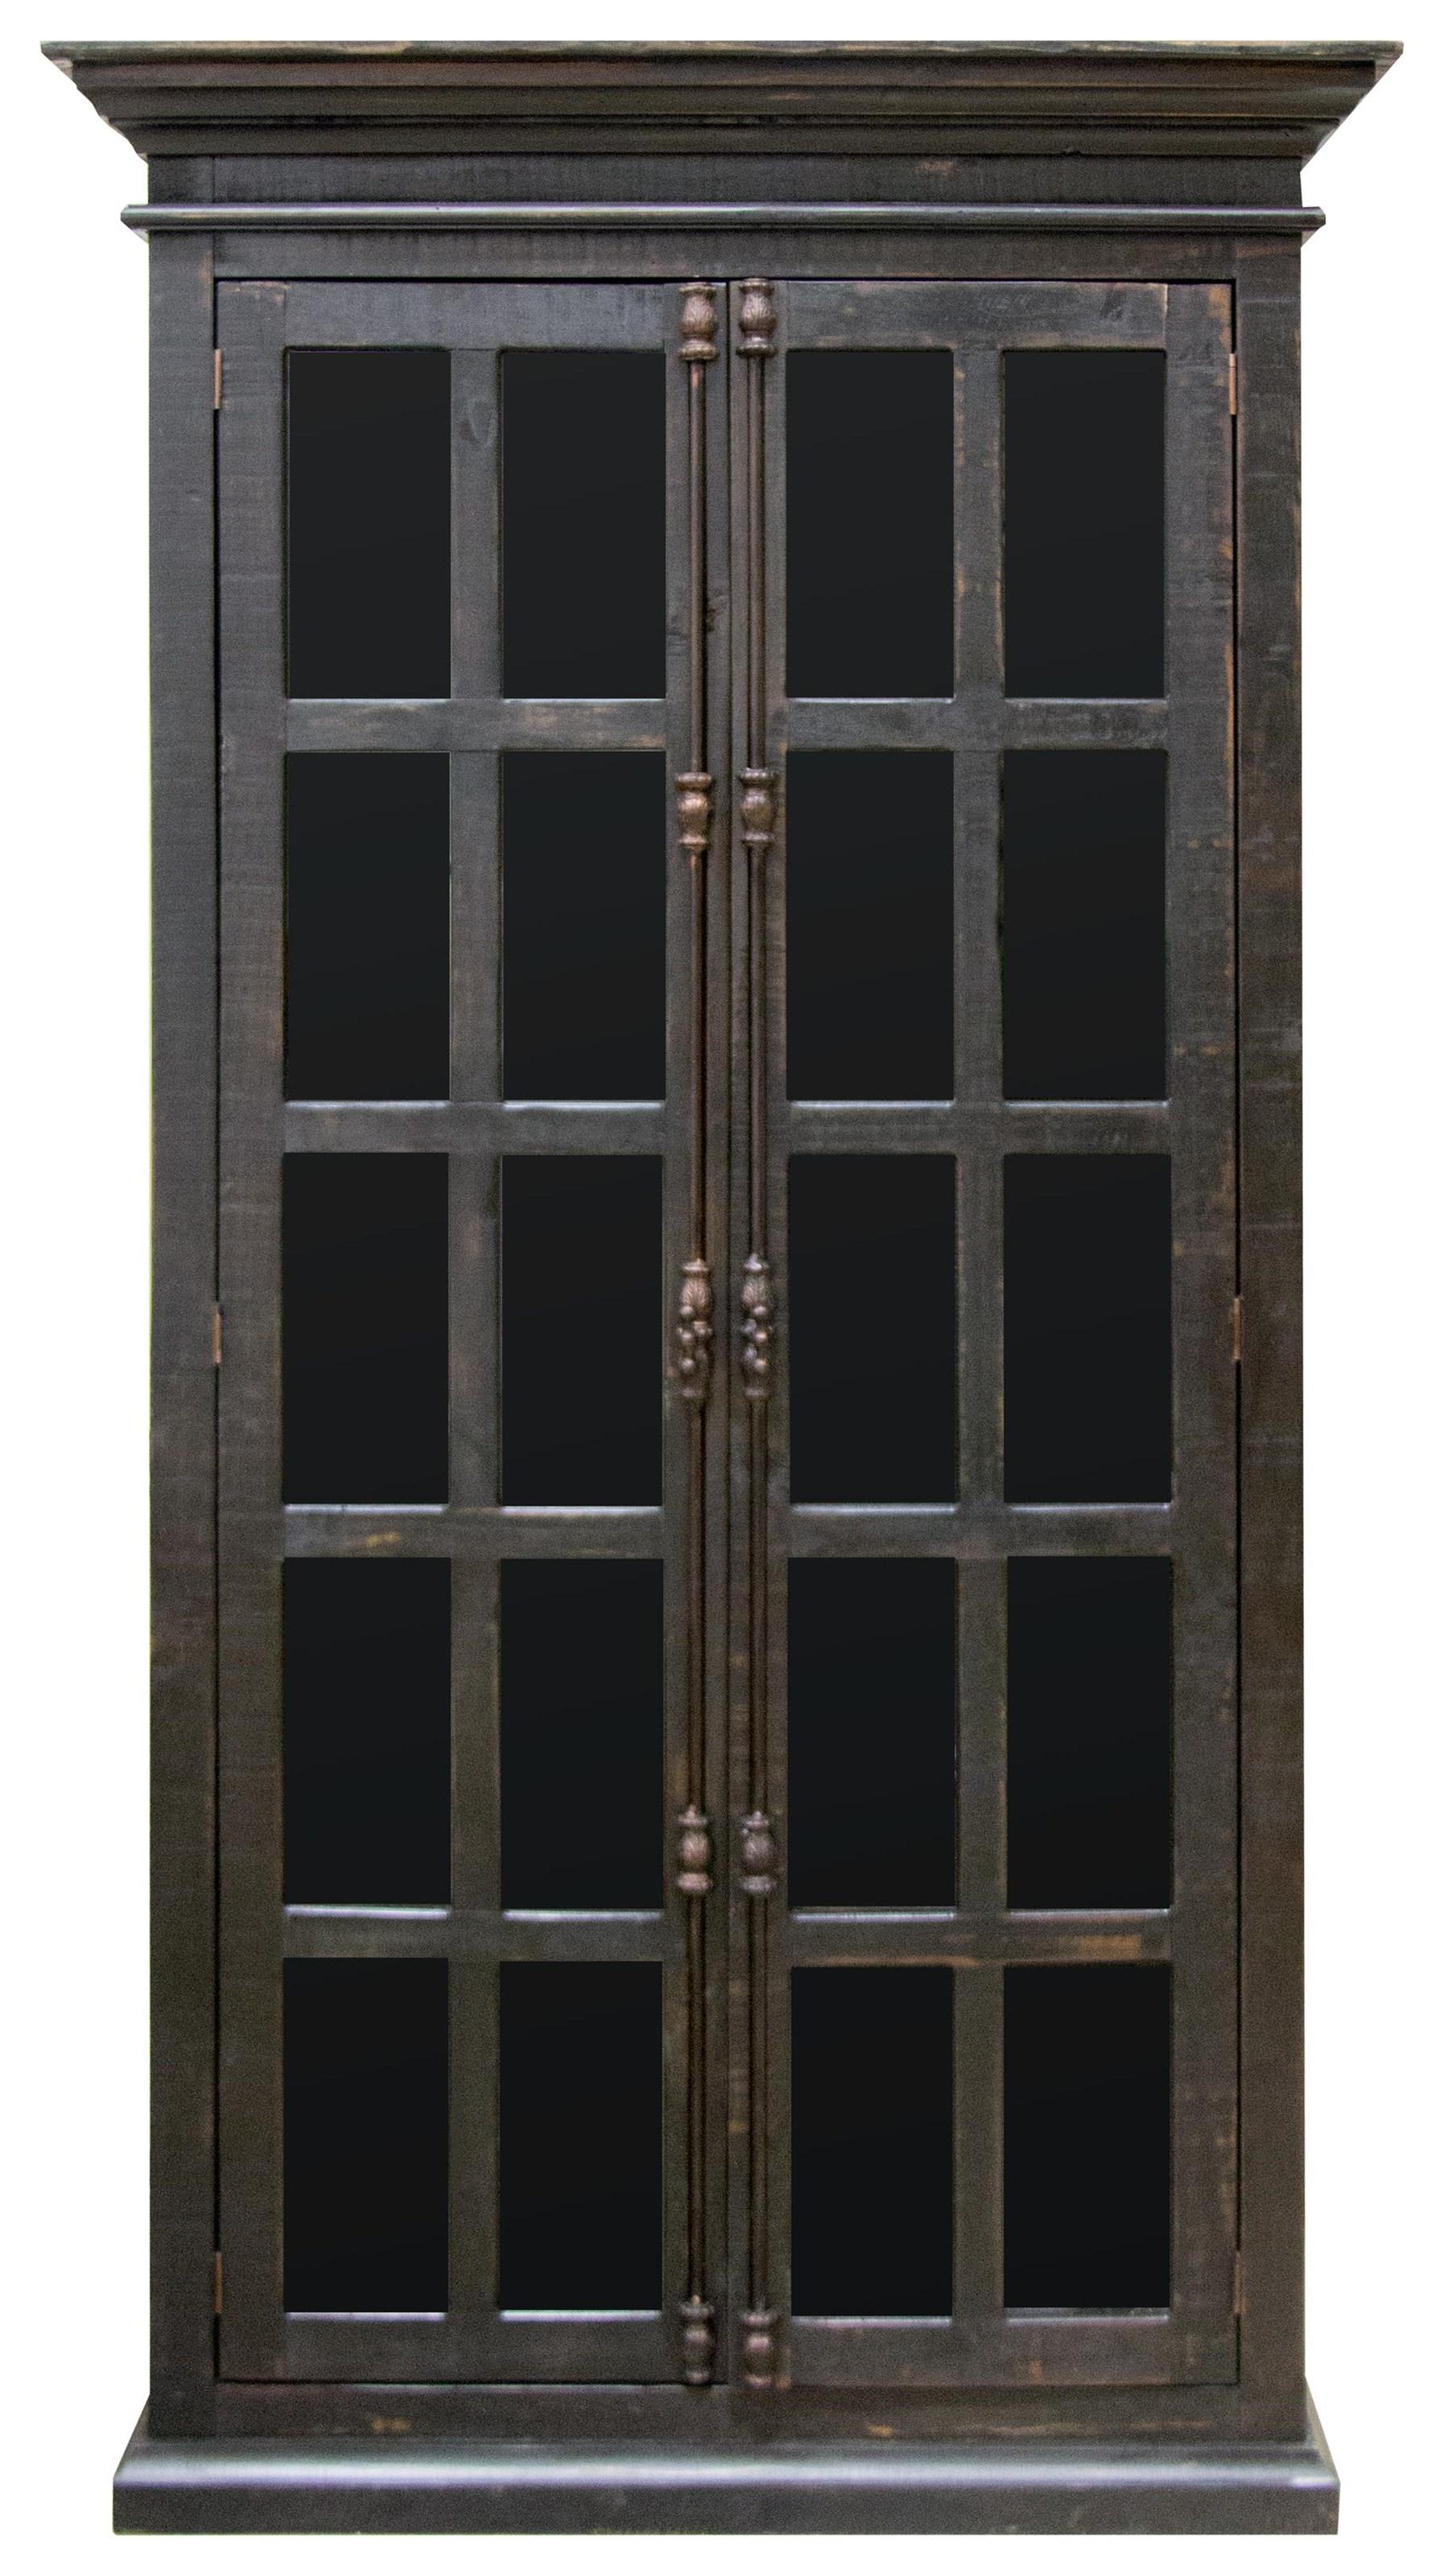 Vintage Accents Madden Black Vitrine Cabinet - Item Number: F-JON877-GTS-NB